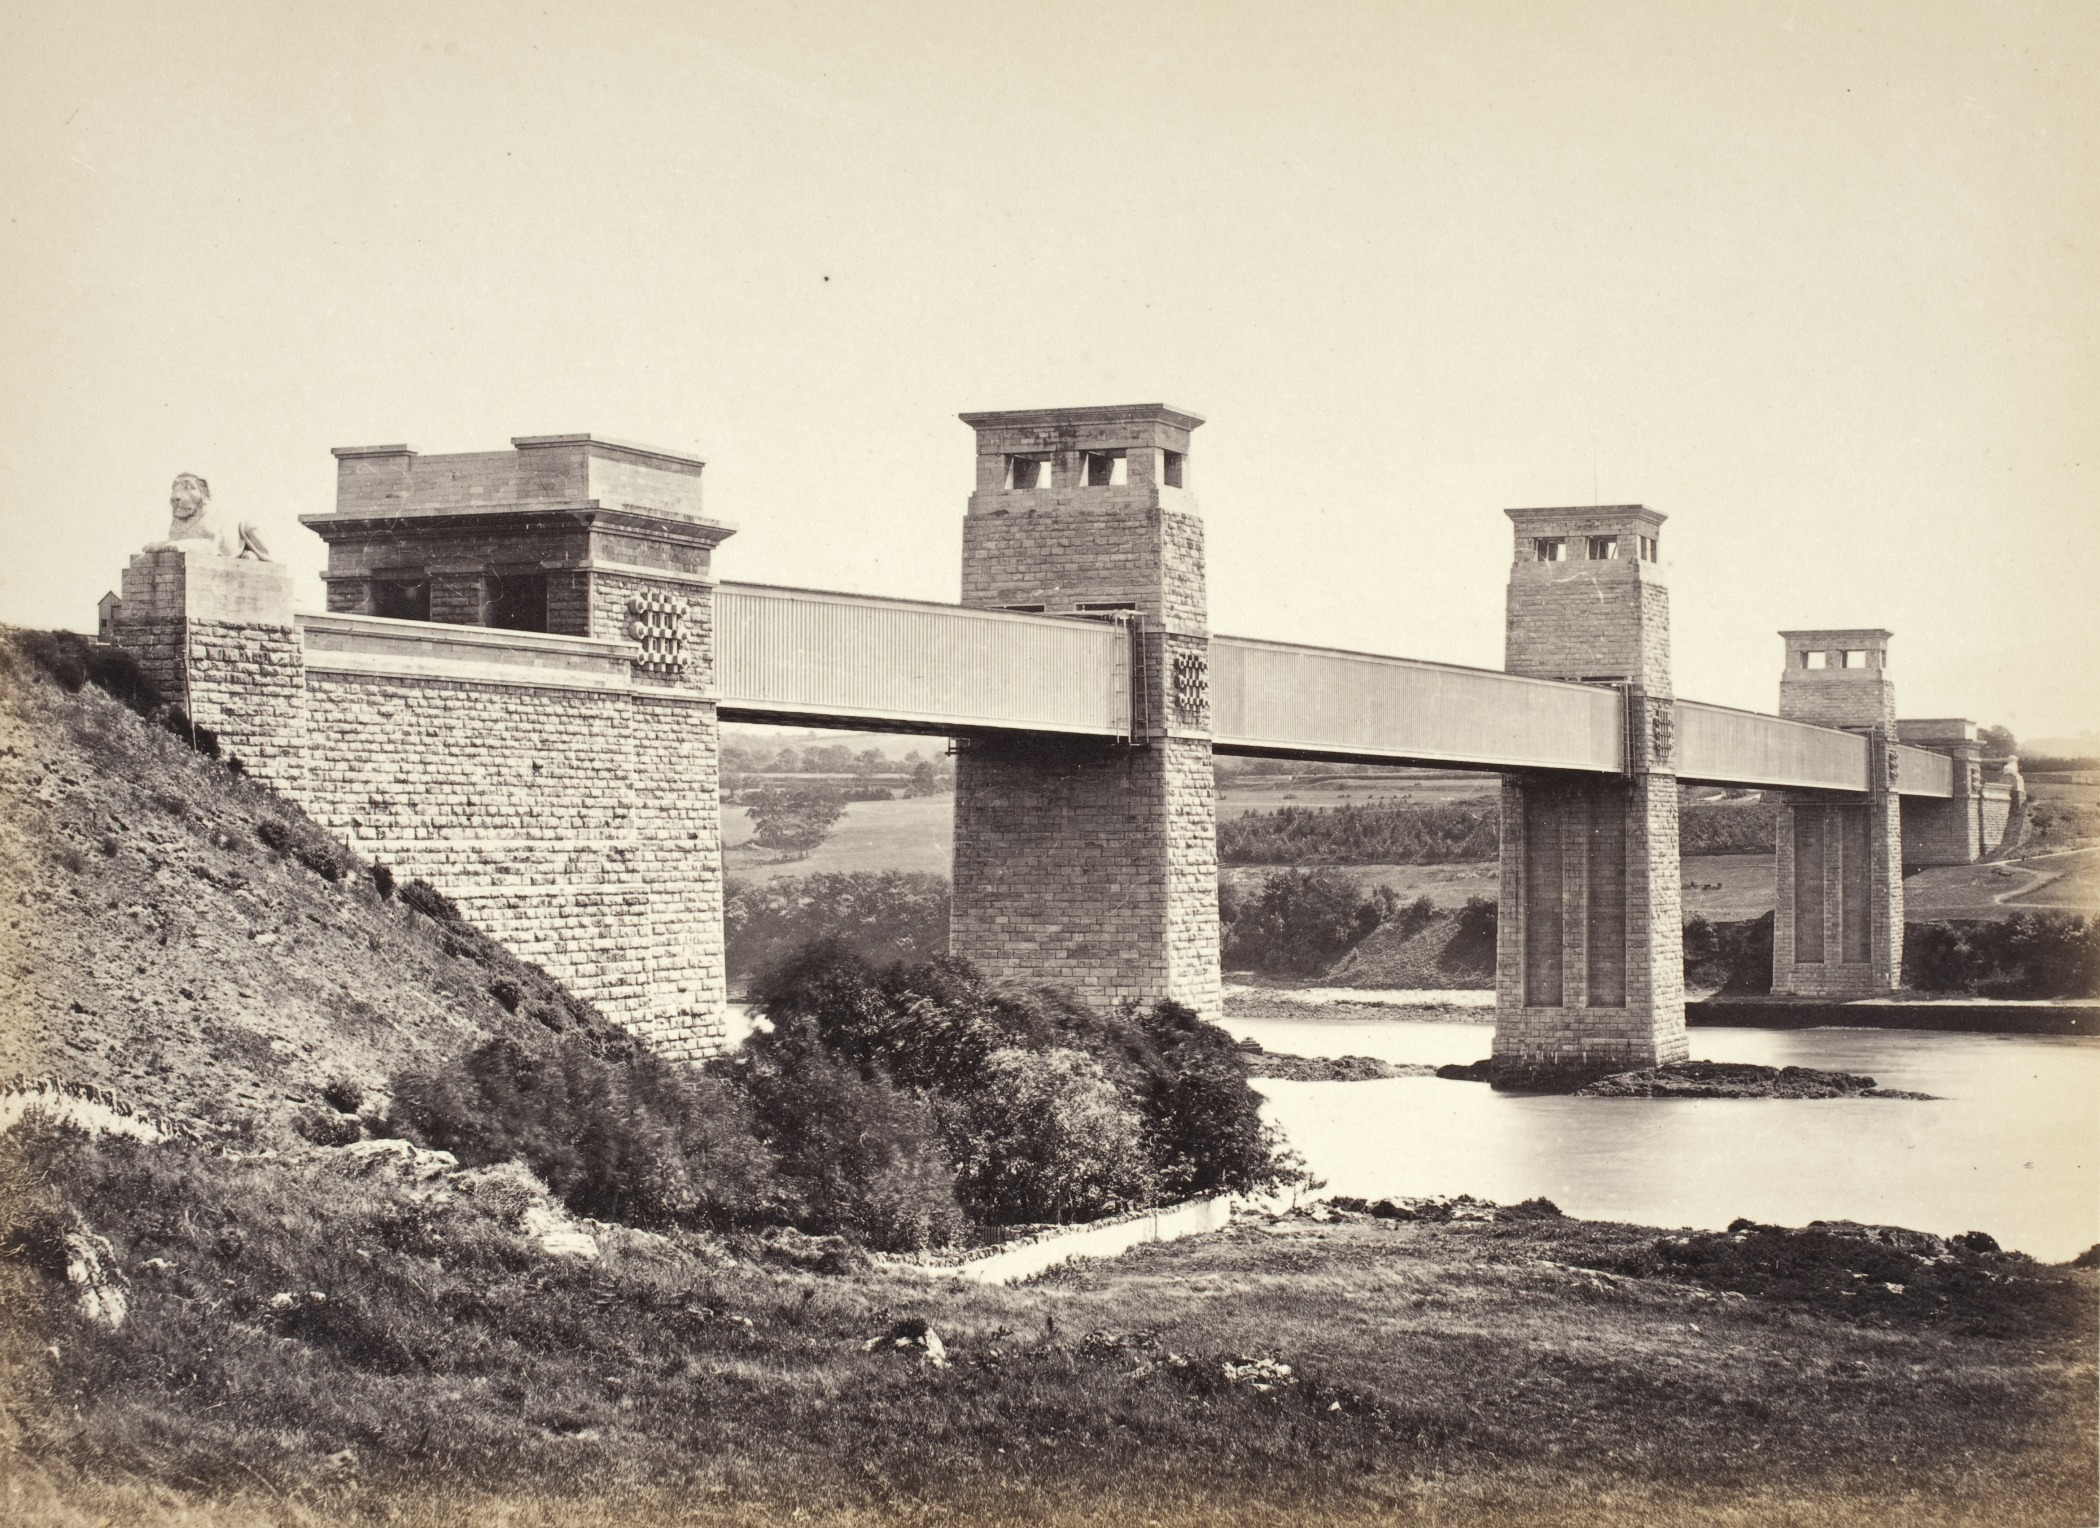 Bangor,_The_Britannia_Bridge,_From_Anglesey_(258)_LACMA_M.2008.40.202.9.jpg